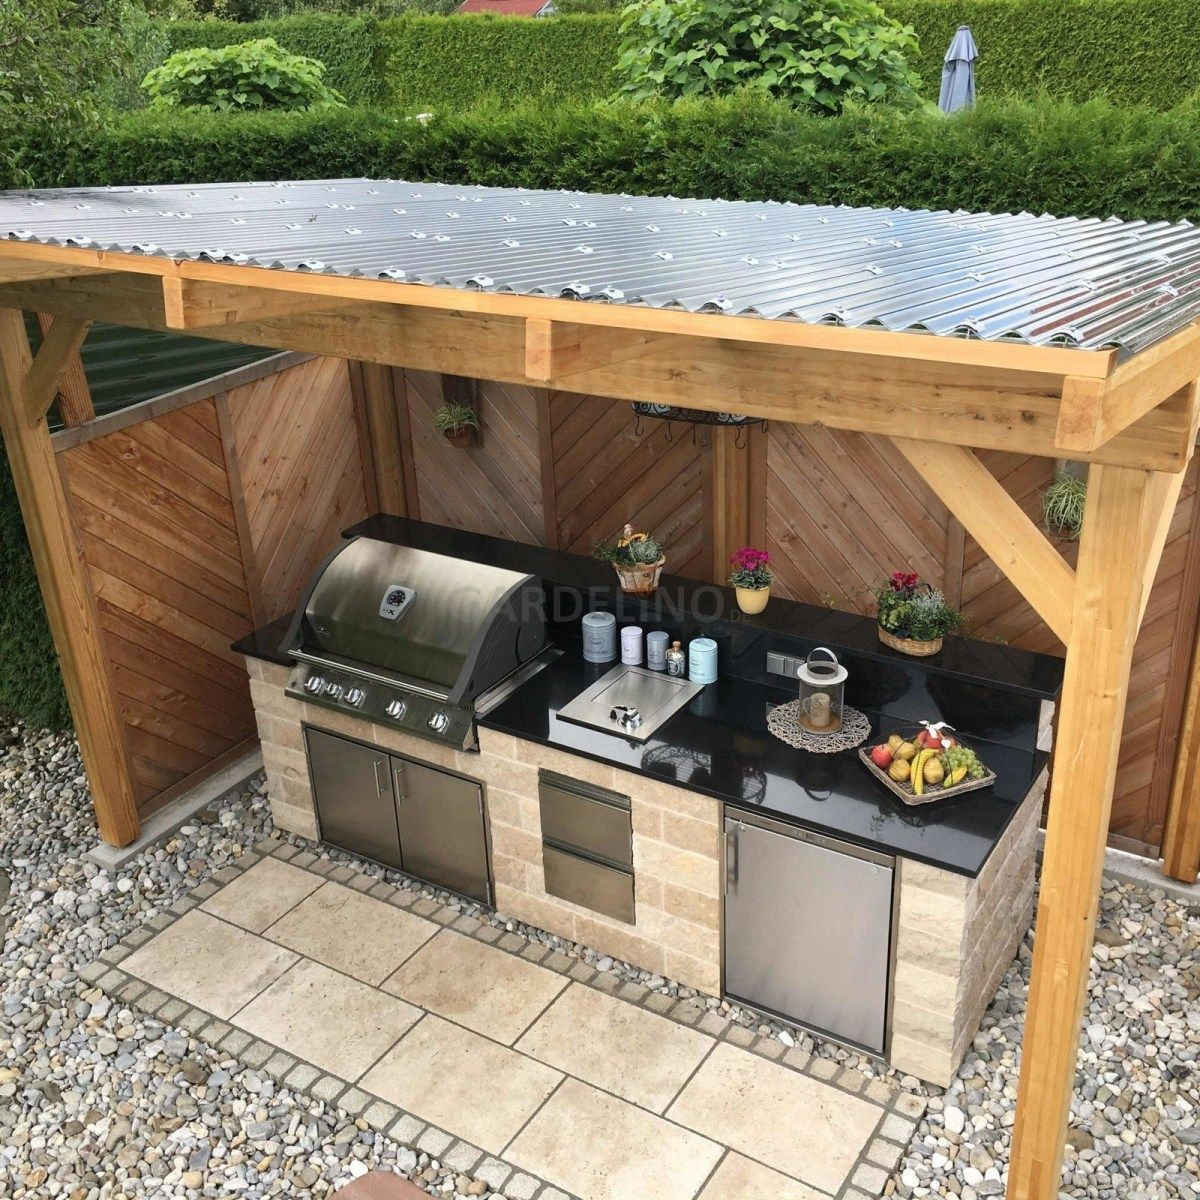 25 incredible outdoor kitchen ideas dapur luar ruangan rumah kayu dekorasi rumah on outdoor kitchen essentials id=76853